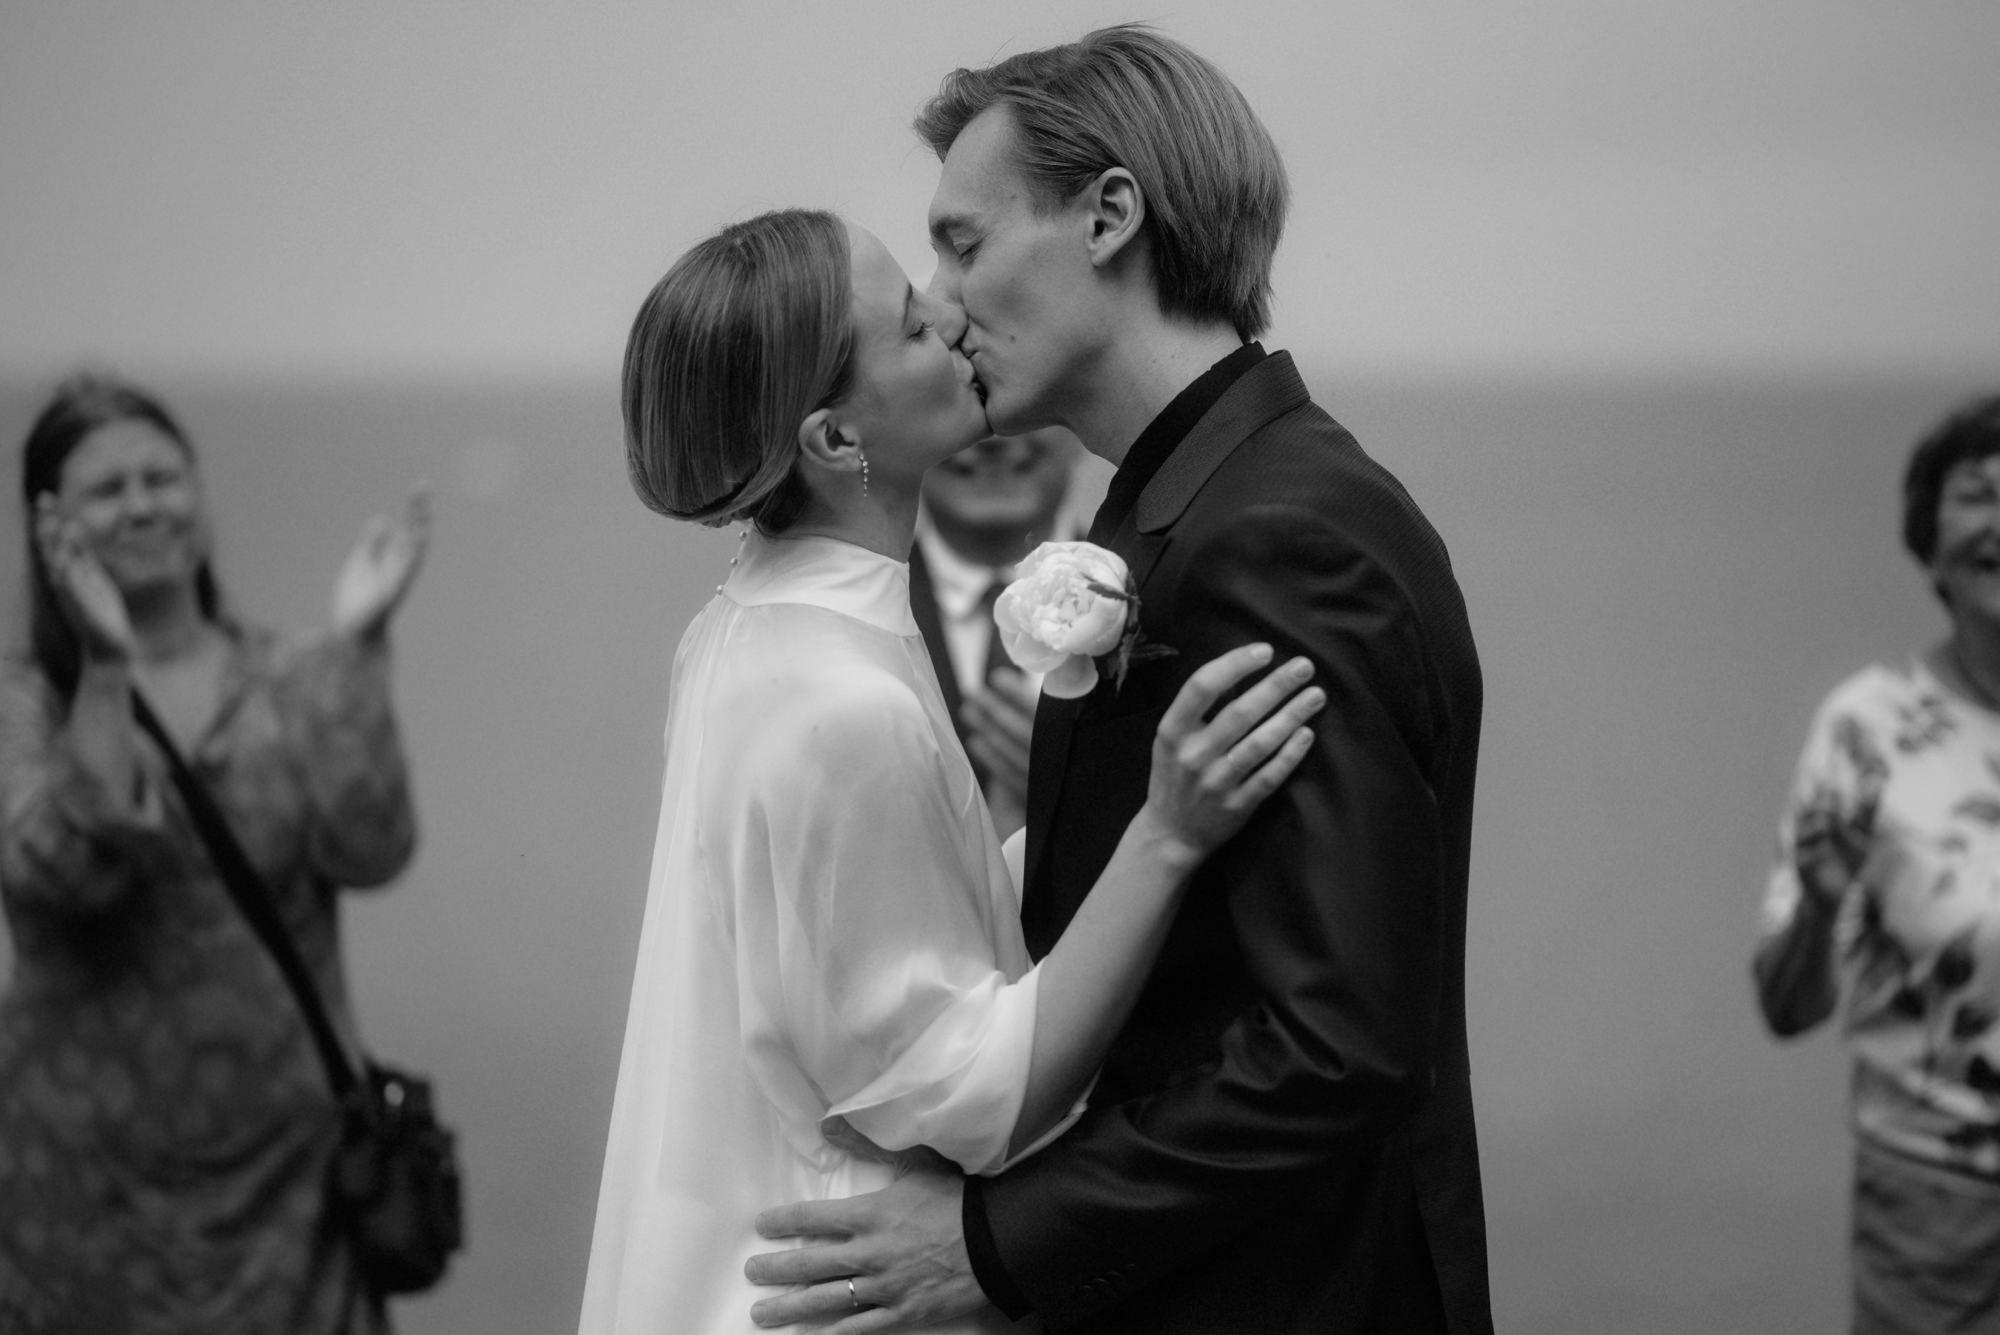 copenhagen wedding photography 0015 1